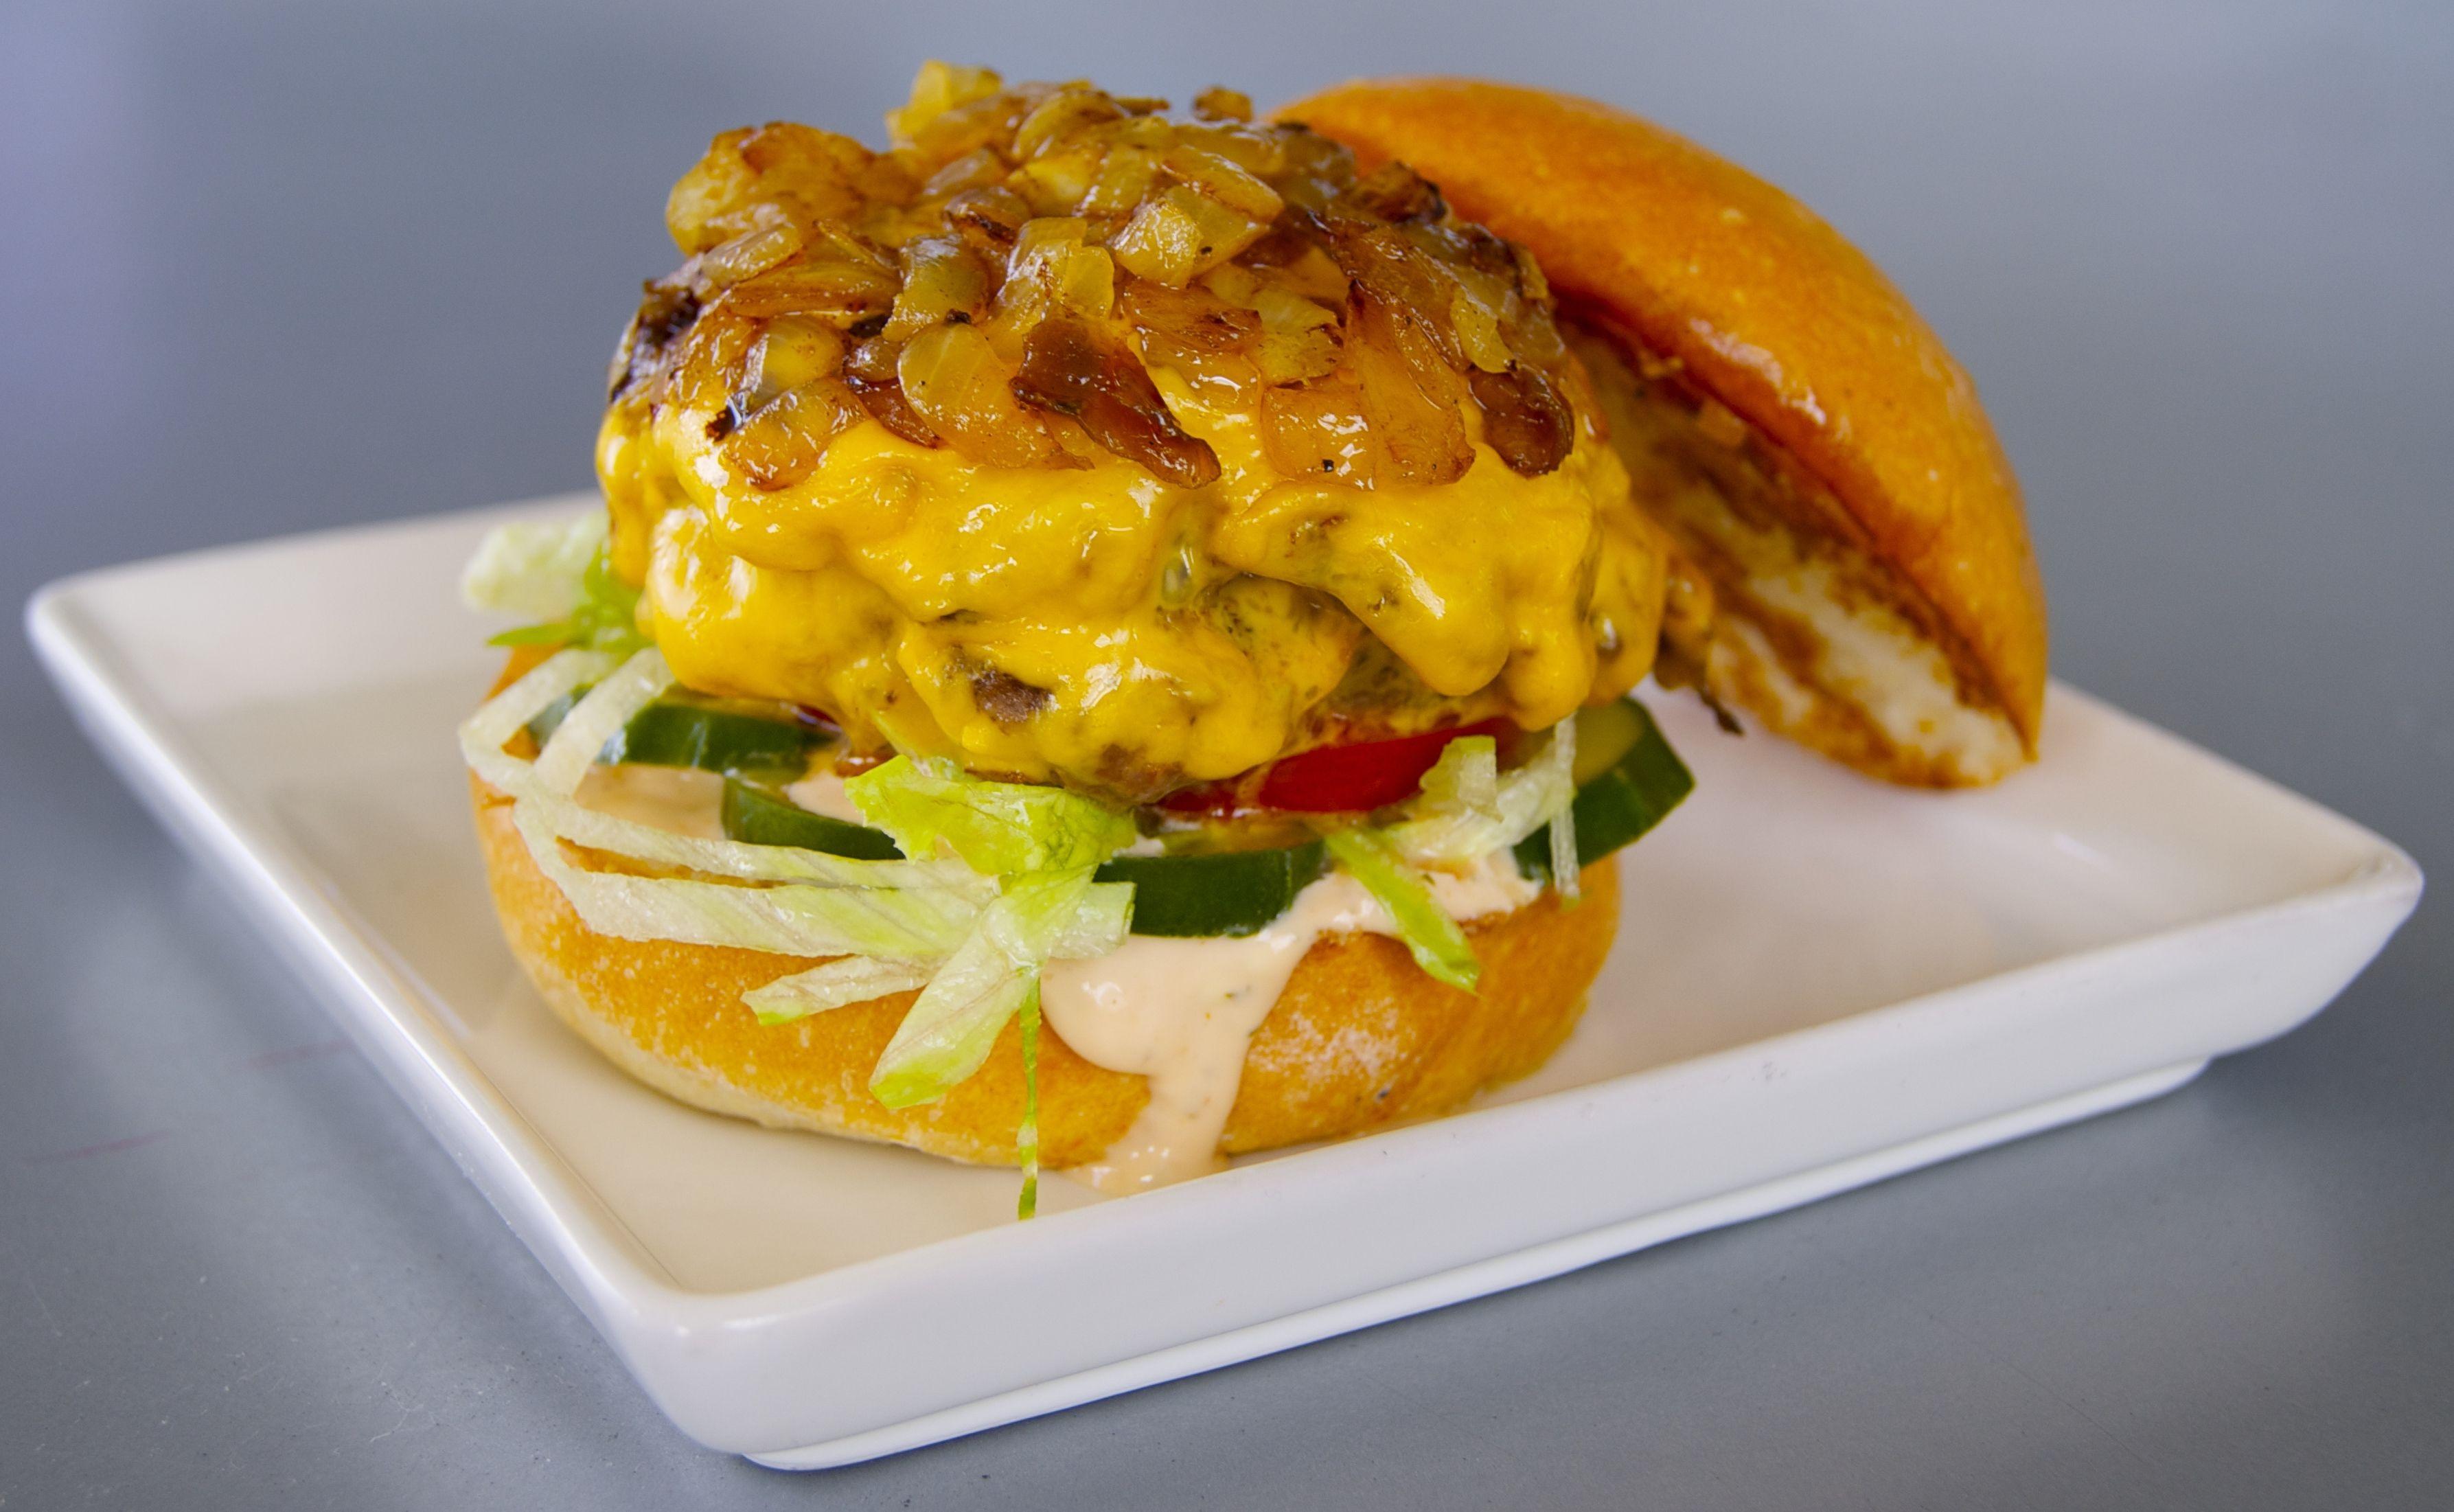 chef gregg piazzi of richard blais u0027s flip burger will be dishing